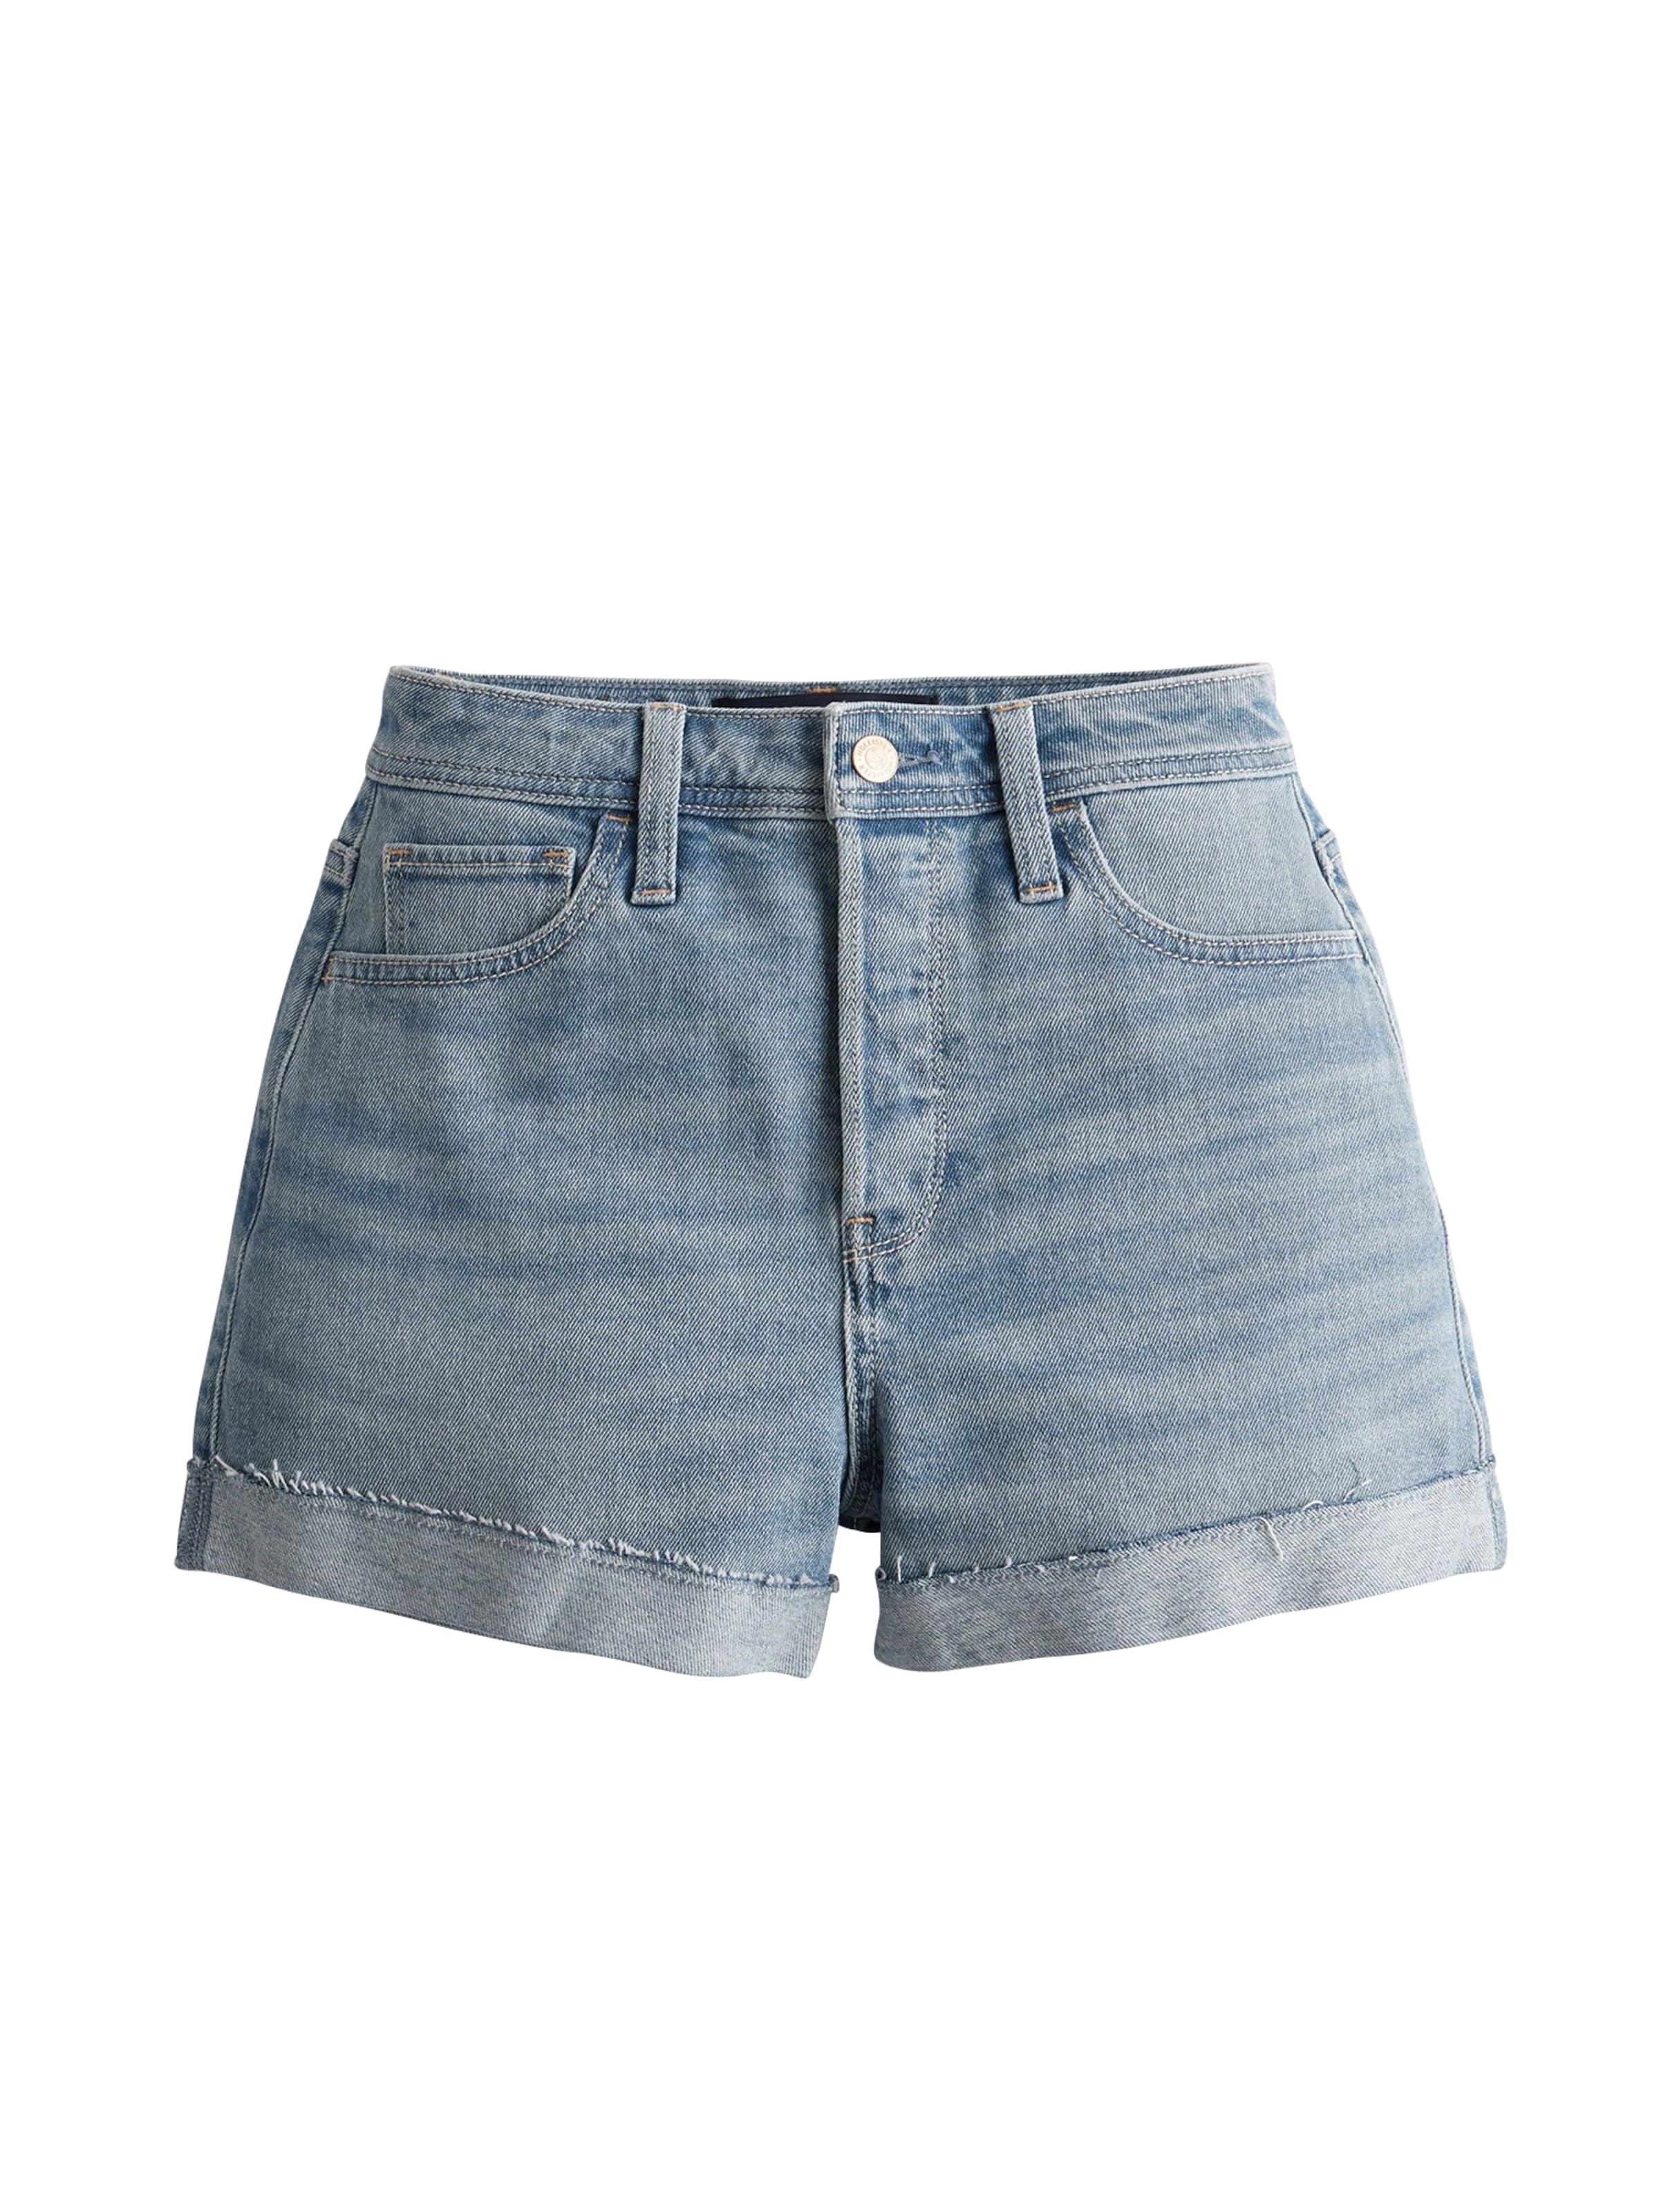 Hollister Denim Hr In Exp dk Short' Blue 'sb19 Jeans Shank Mom TZlOkwPXiu